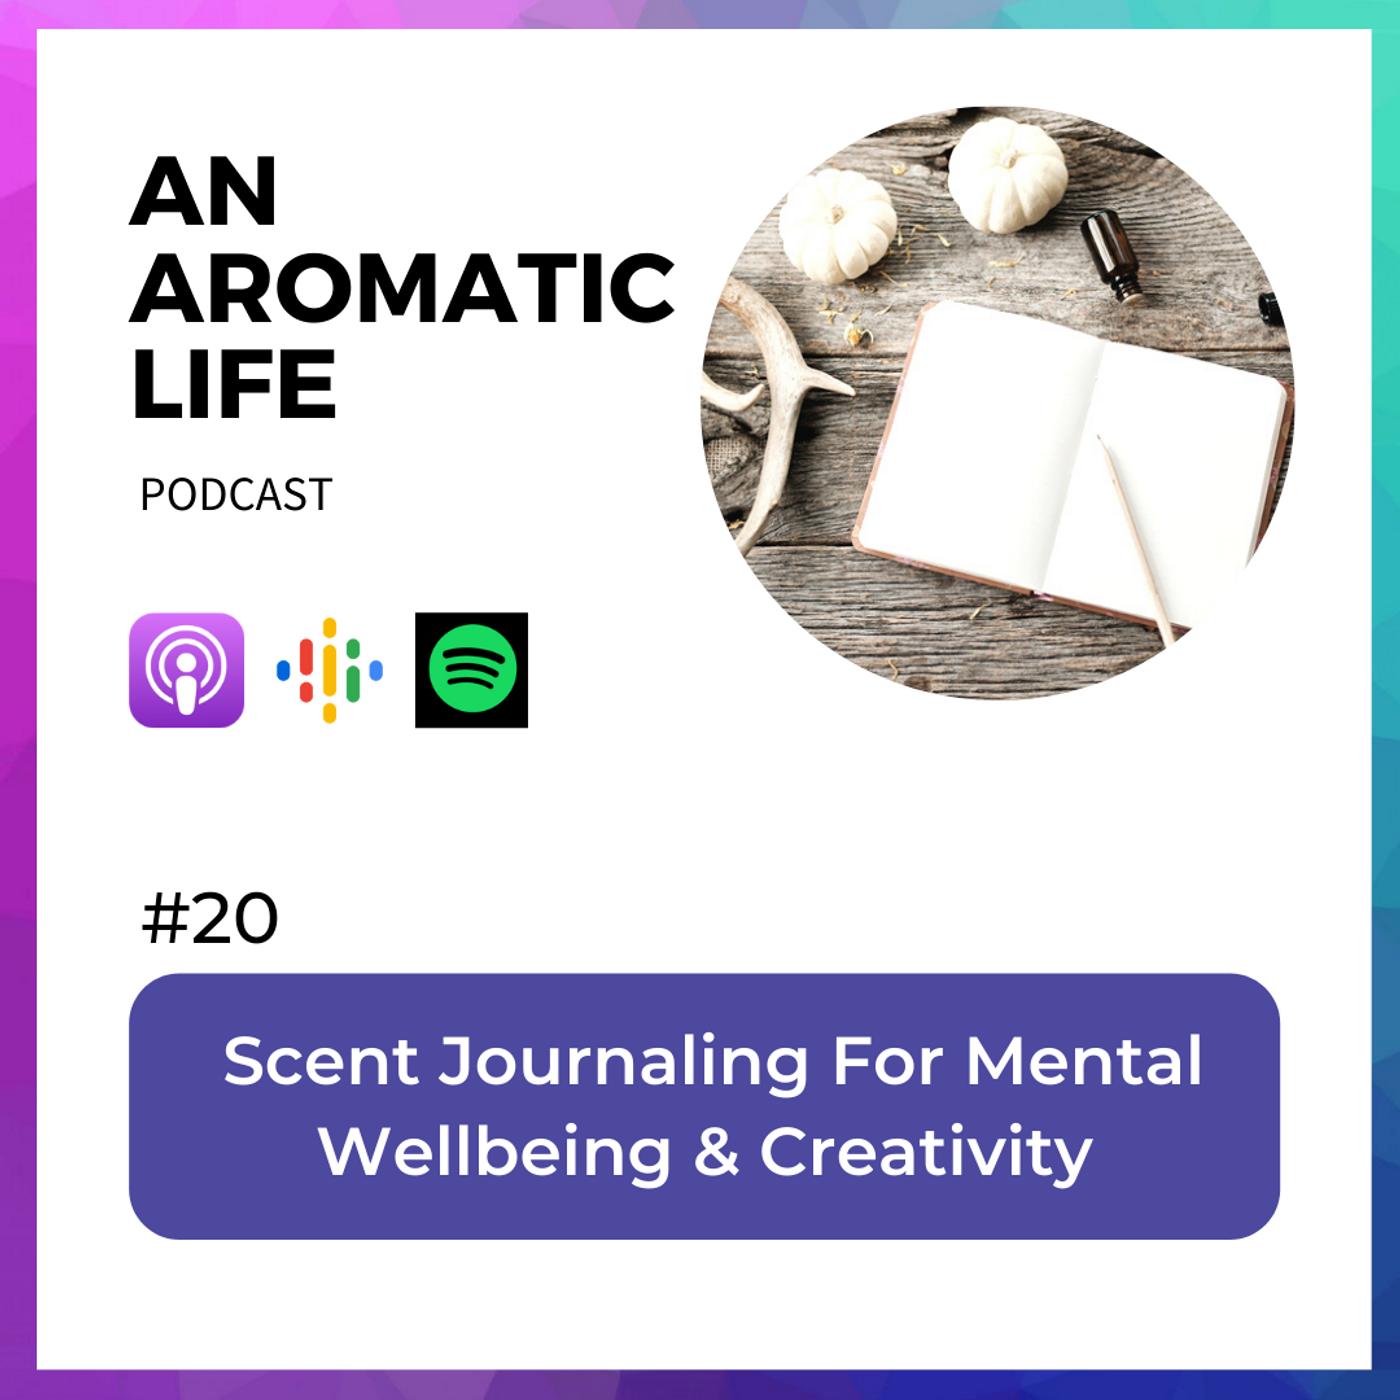 Zg4cbmwwqoo3wsorm8by podcast episode 20